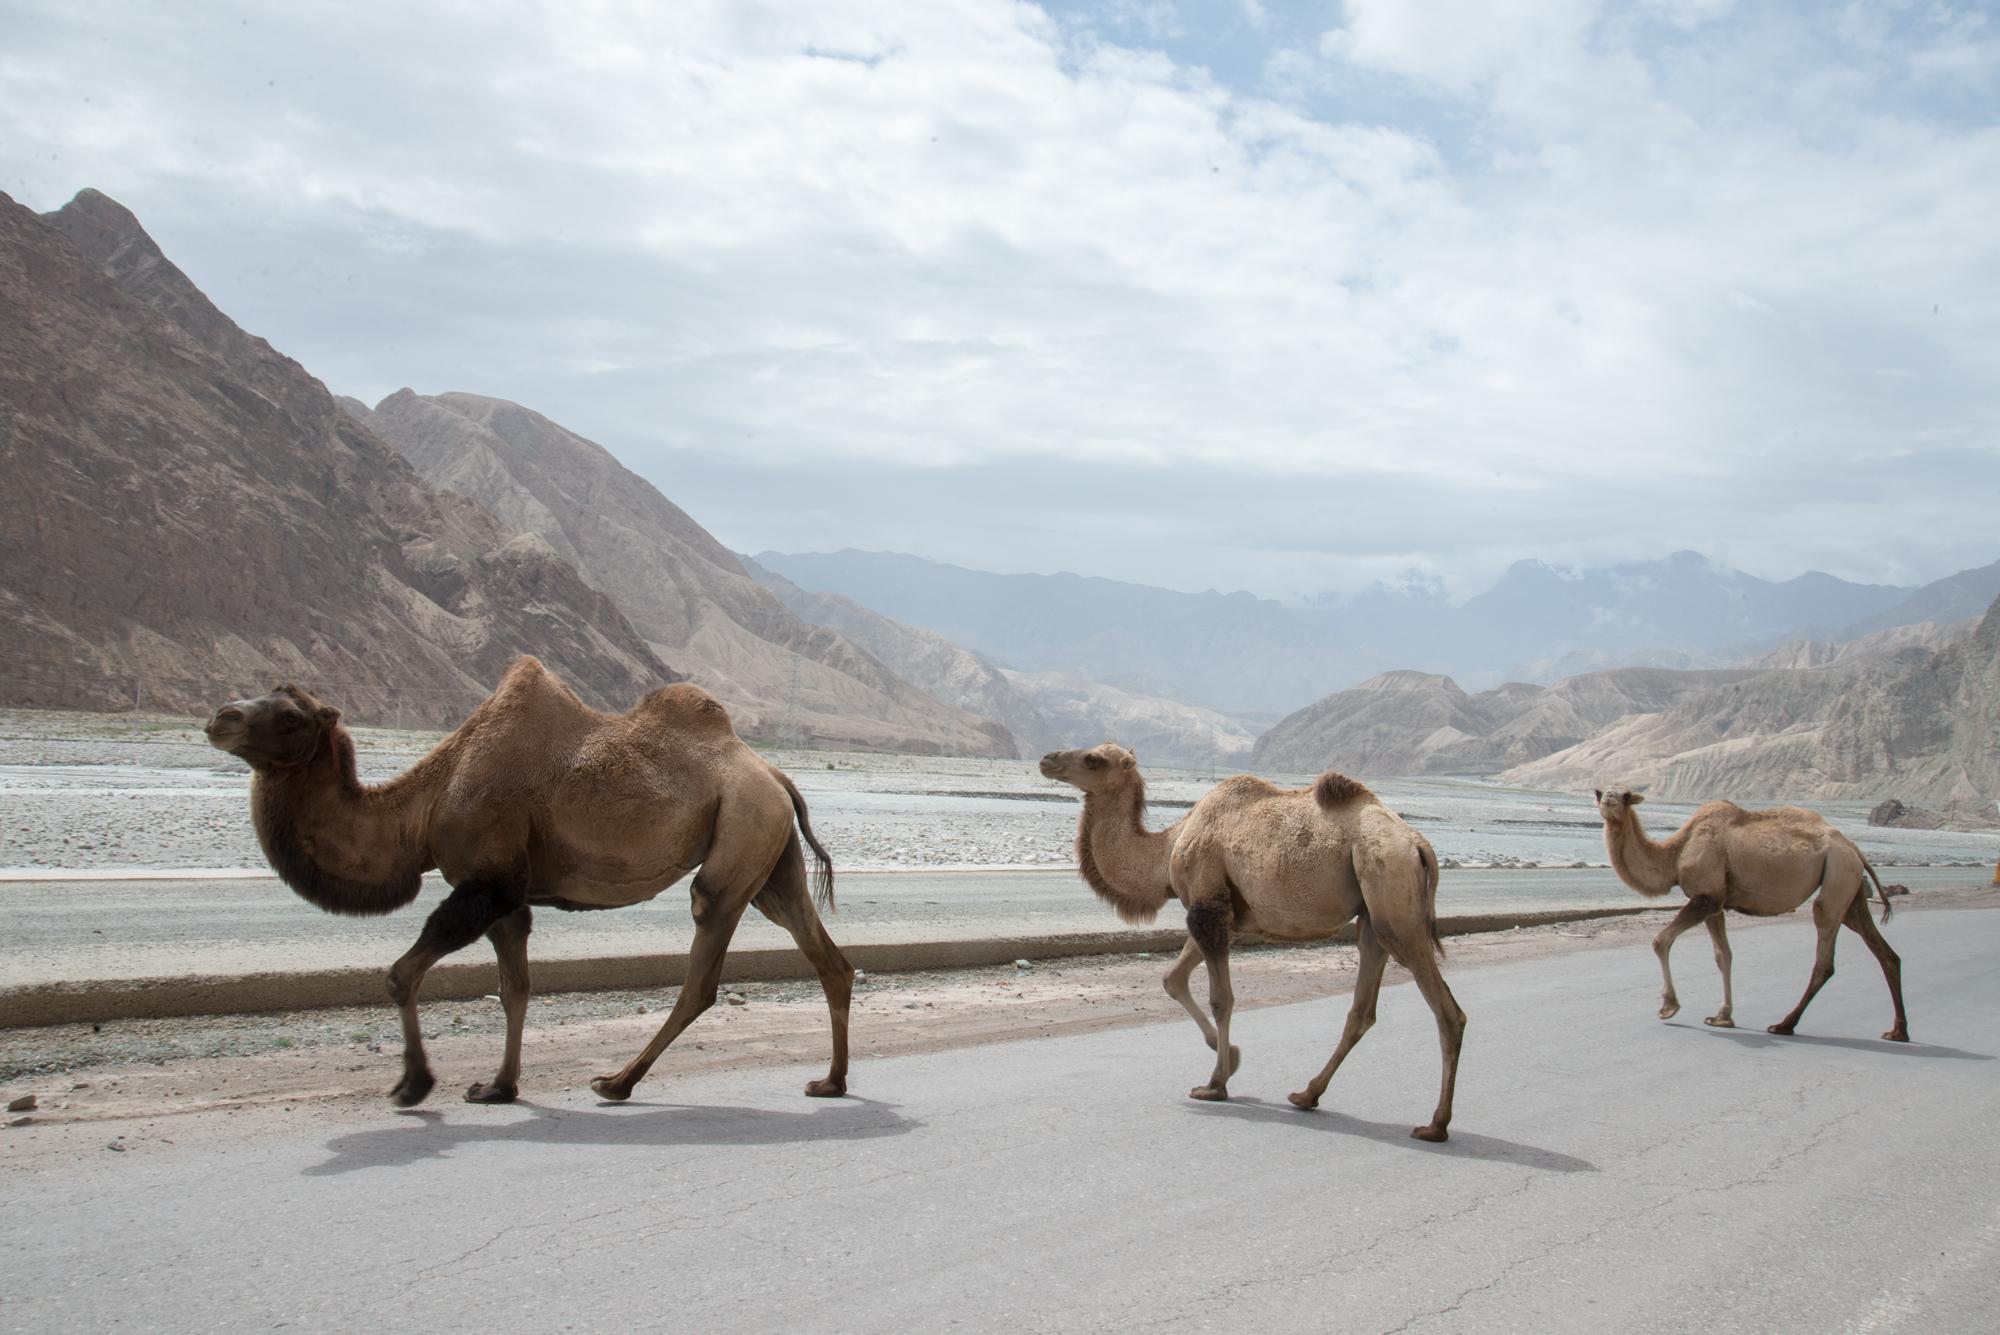 Camels crossing Karakoram Hwy near Kashgar